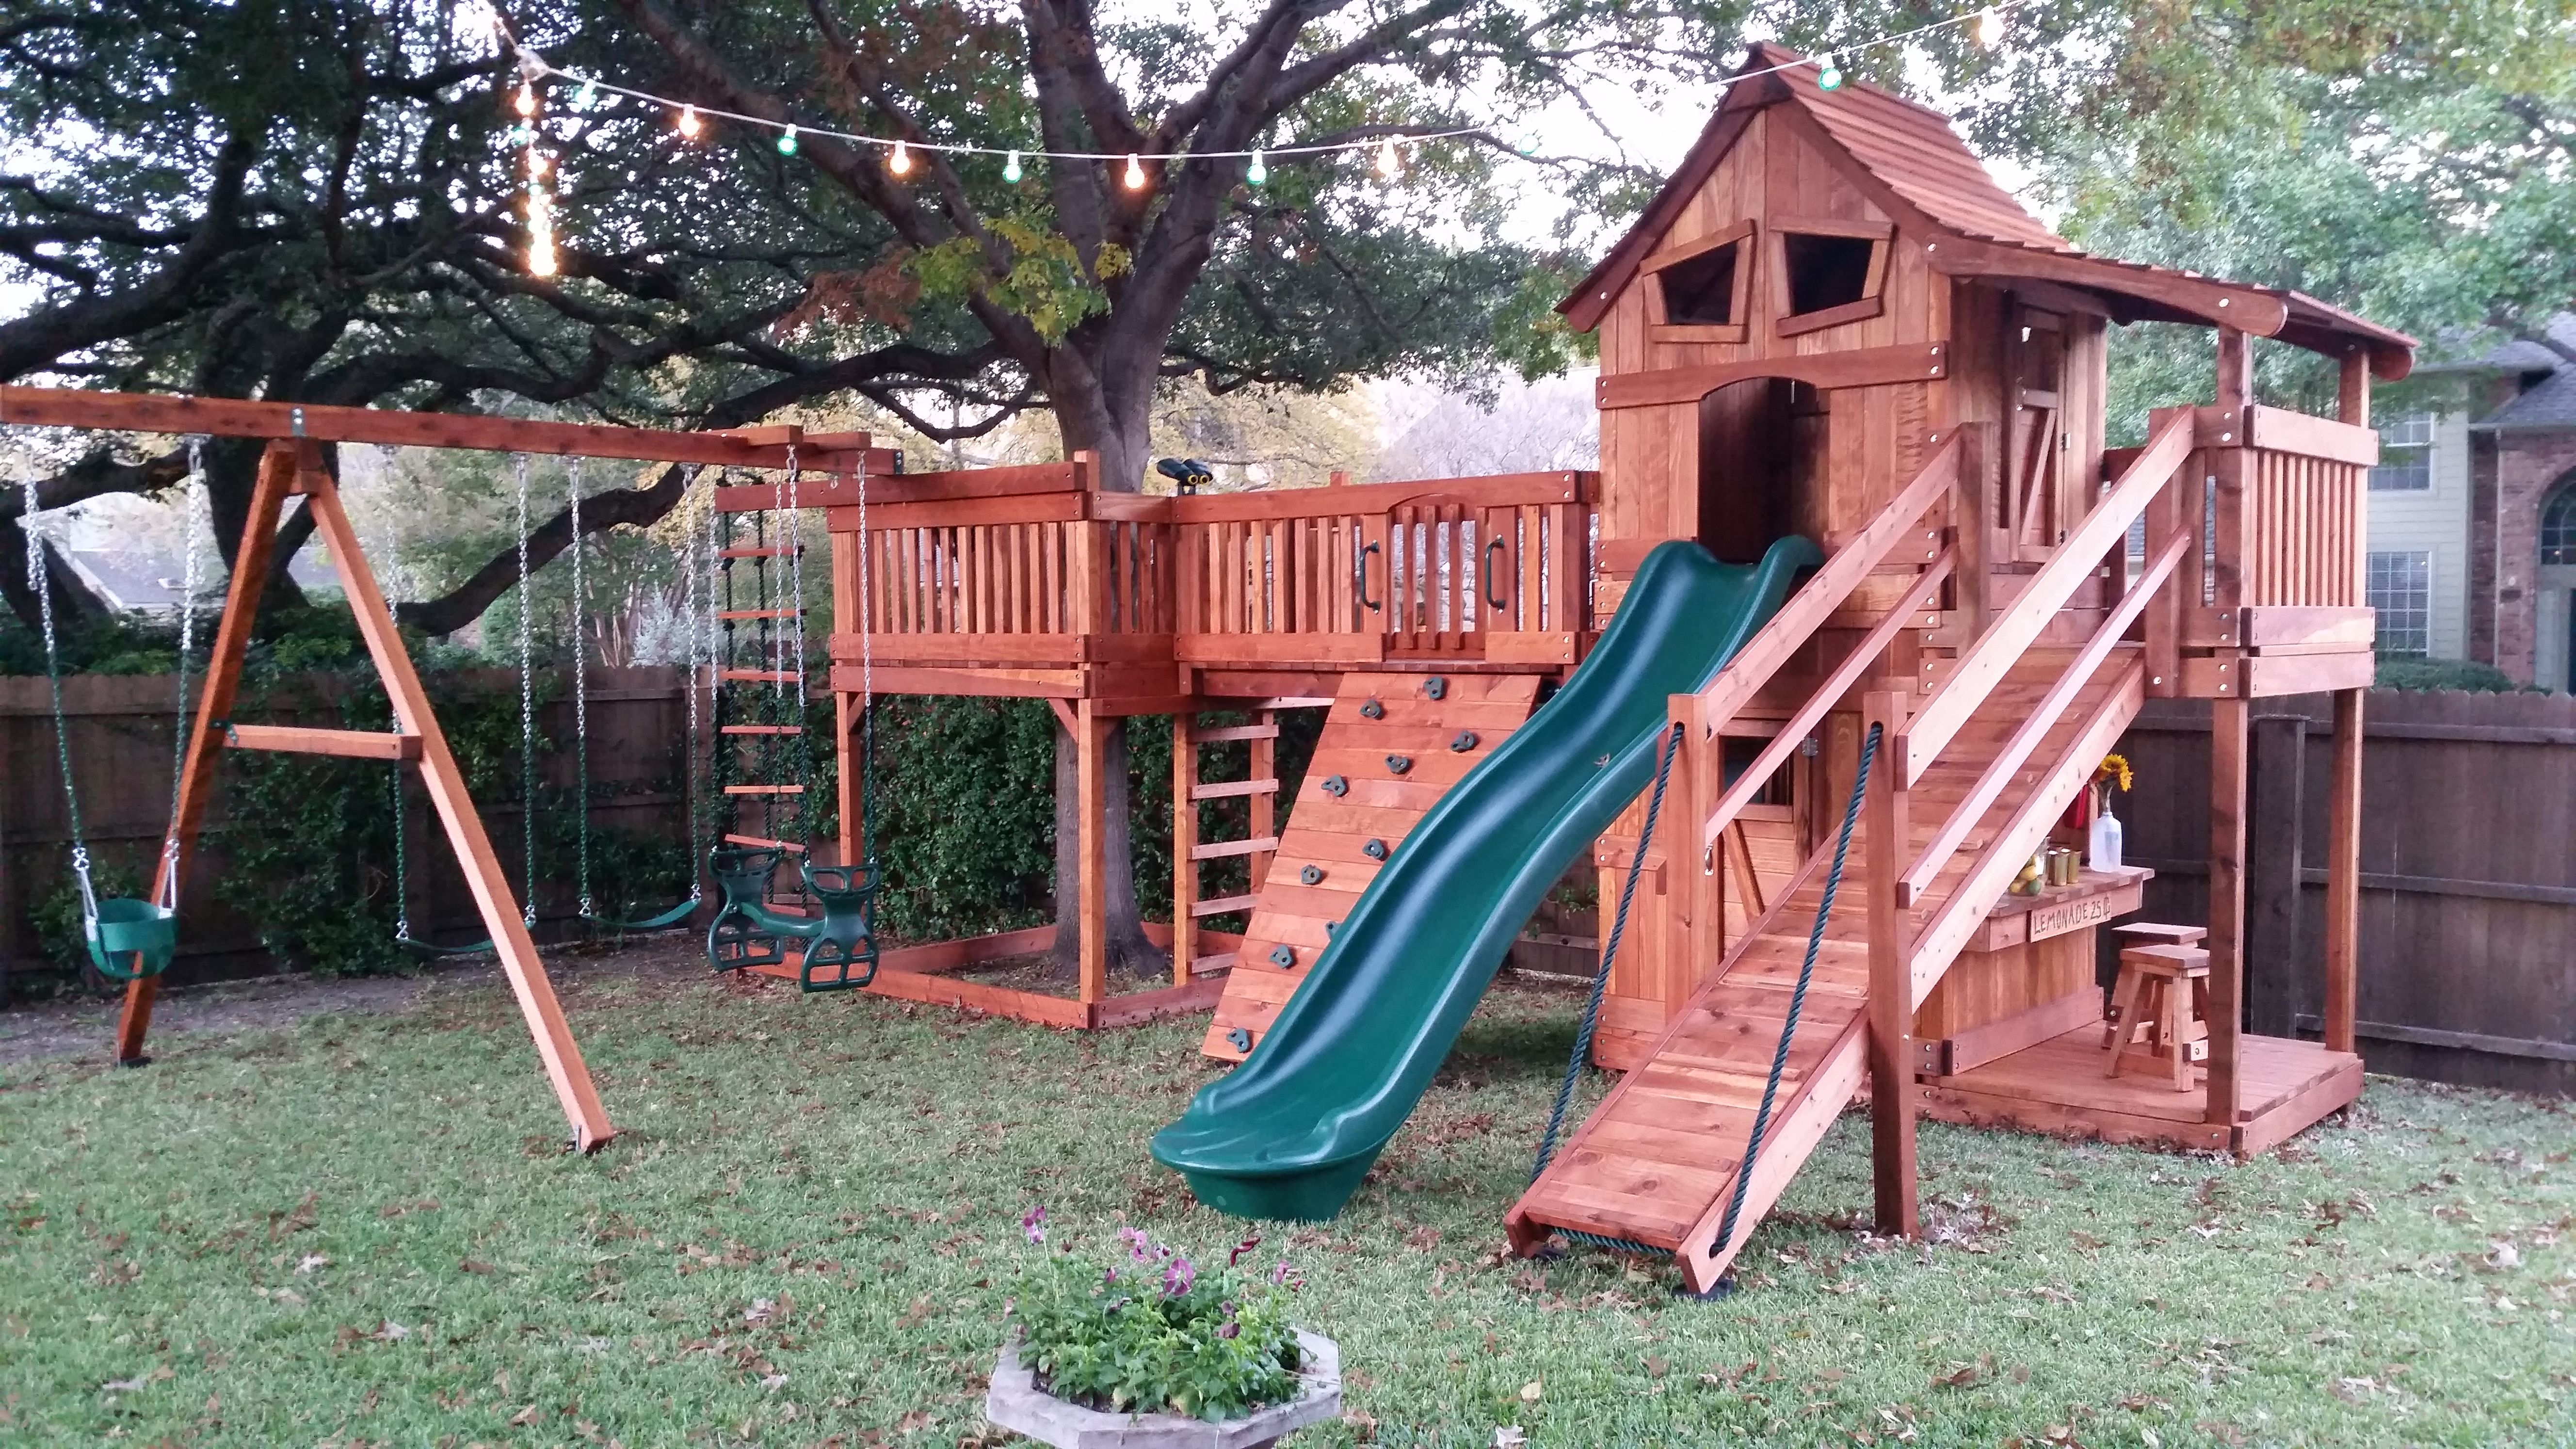 Bridged Wooden Swing Sets Backyard Swing Sets Deck Designs Backyard Decks Backyard